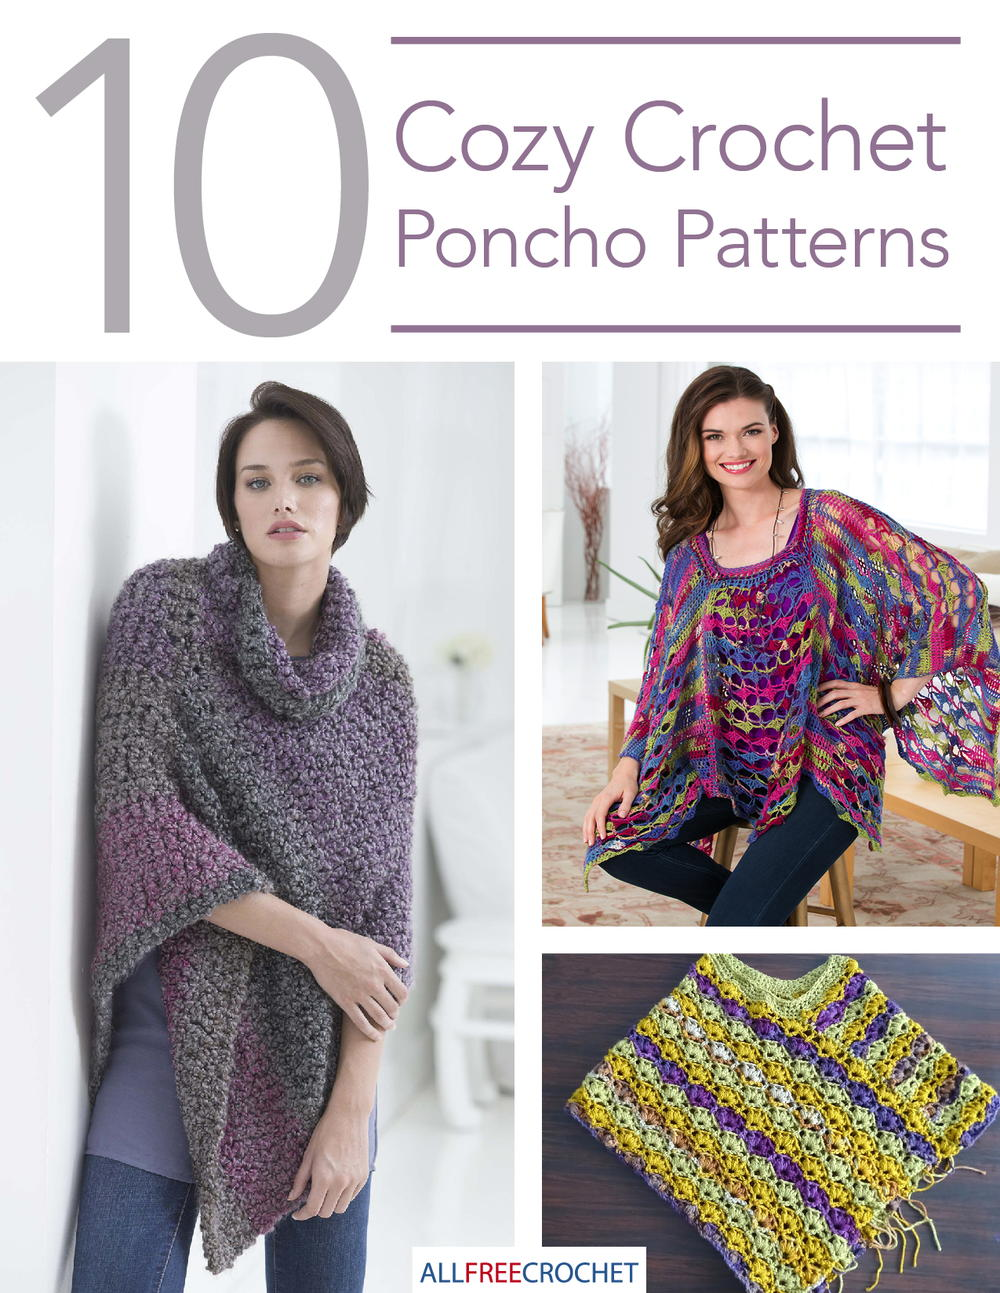 10 Cozy Crochet Poncho Patterns Allfreecrochetcom